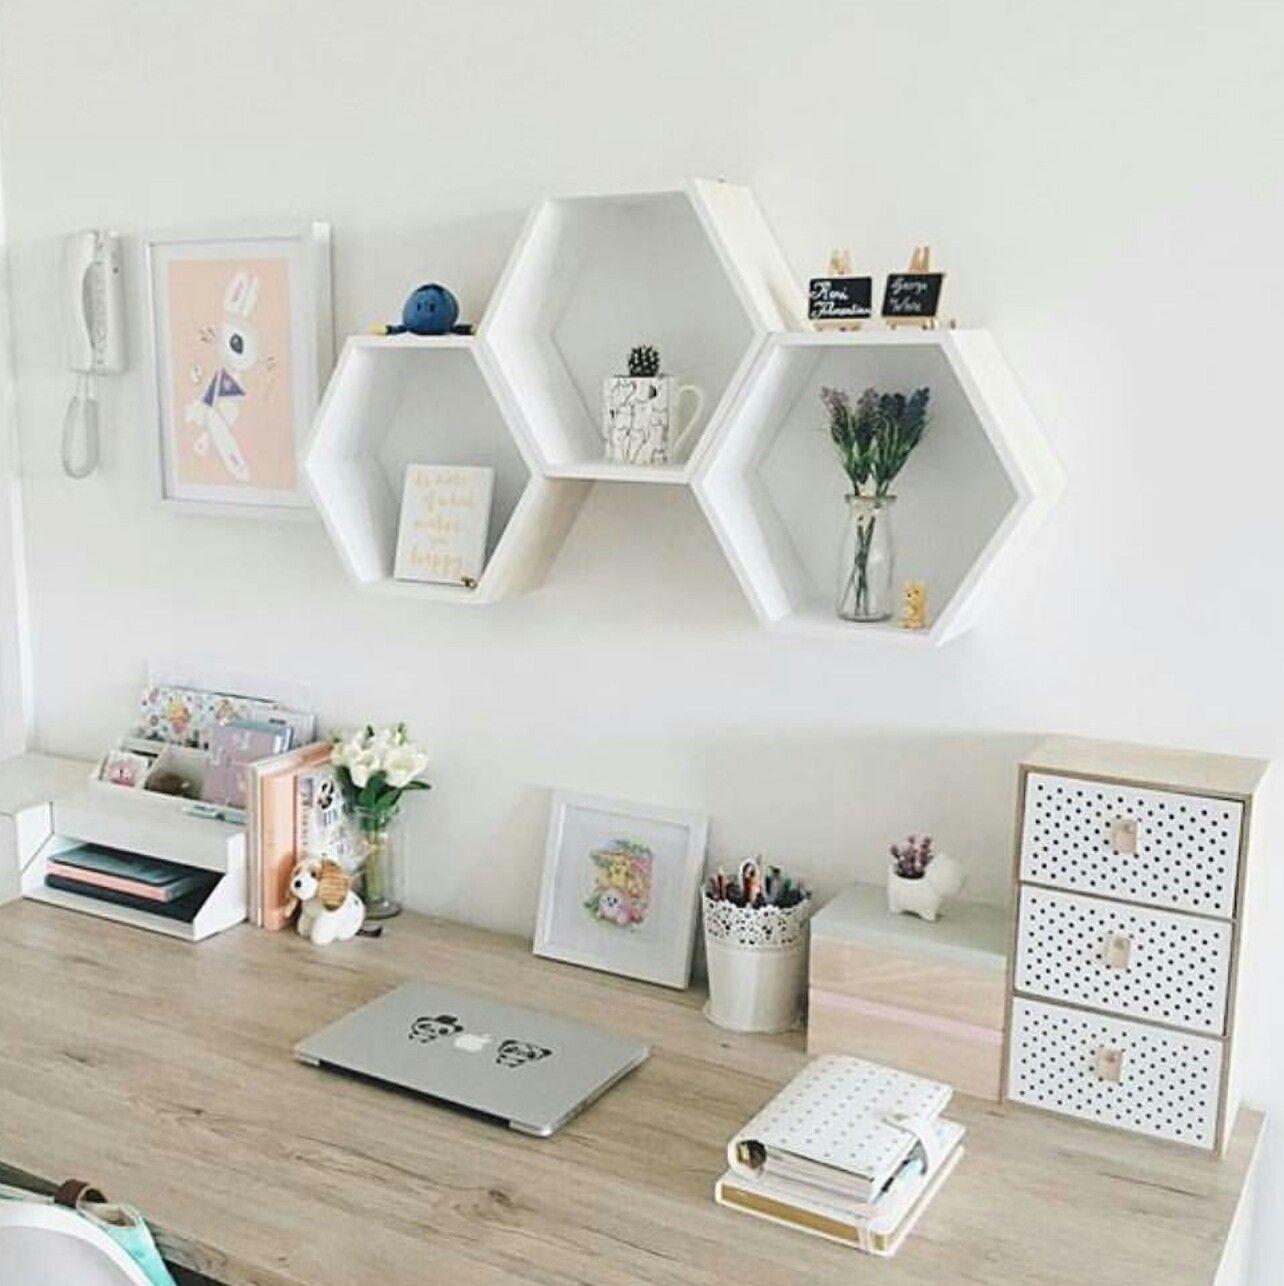 Home decoration deco office minimalist work minimal decoracion de espacio trabajo almacenaje bureau diy decor organization also rh pinterest